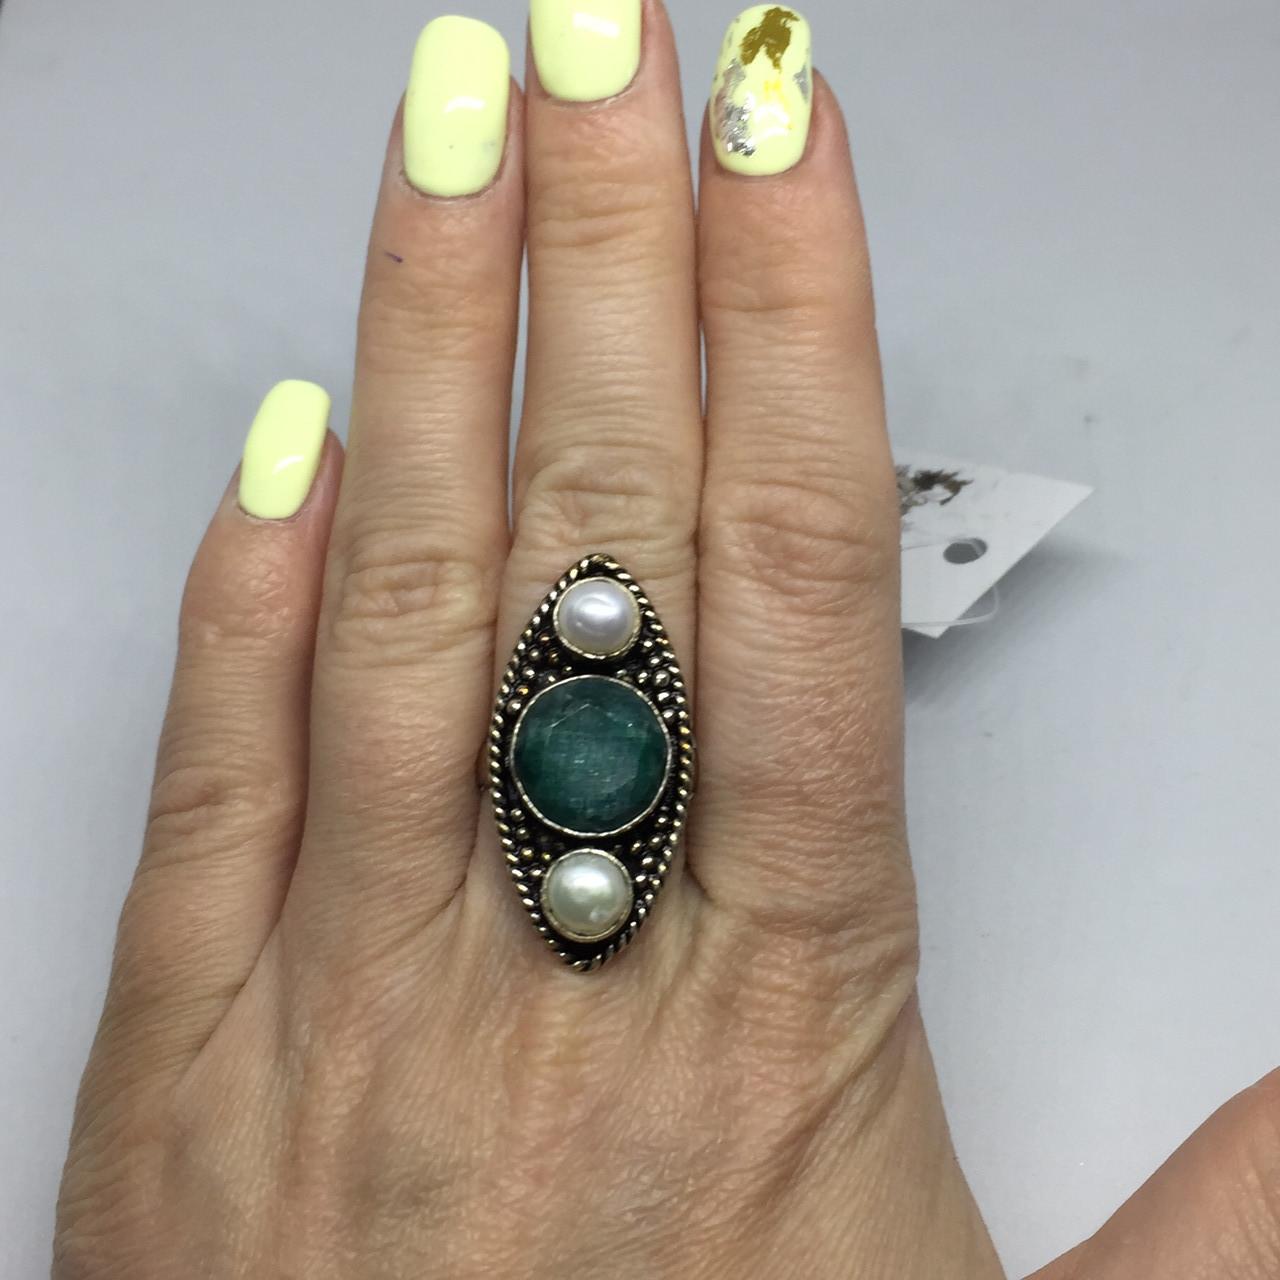 Изумруд жемчуг кольцо с камнями изумруд и жемчуг в серебре. Размер 17